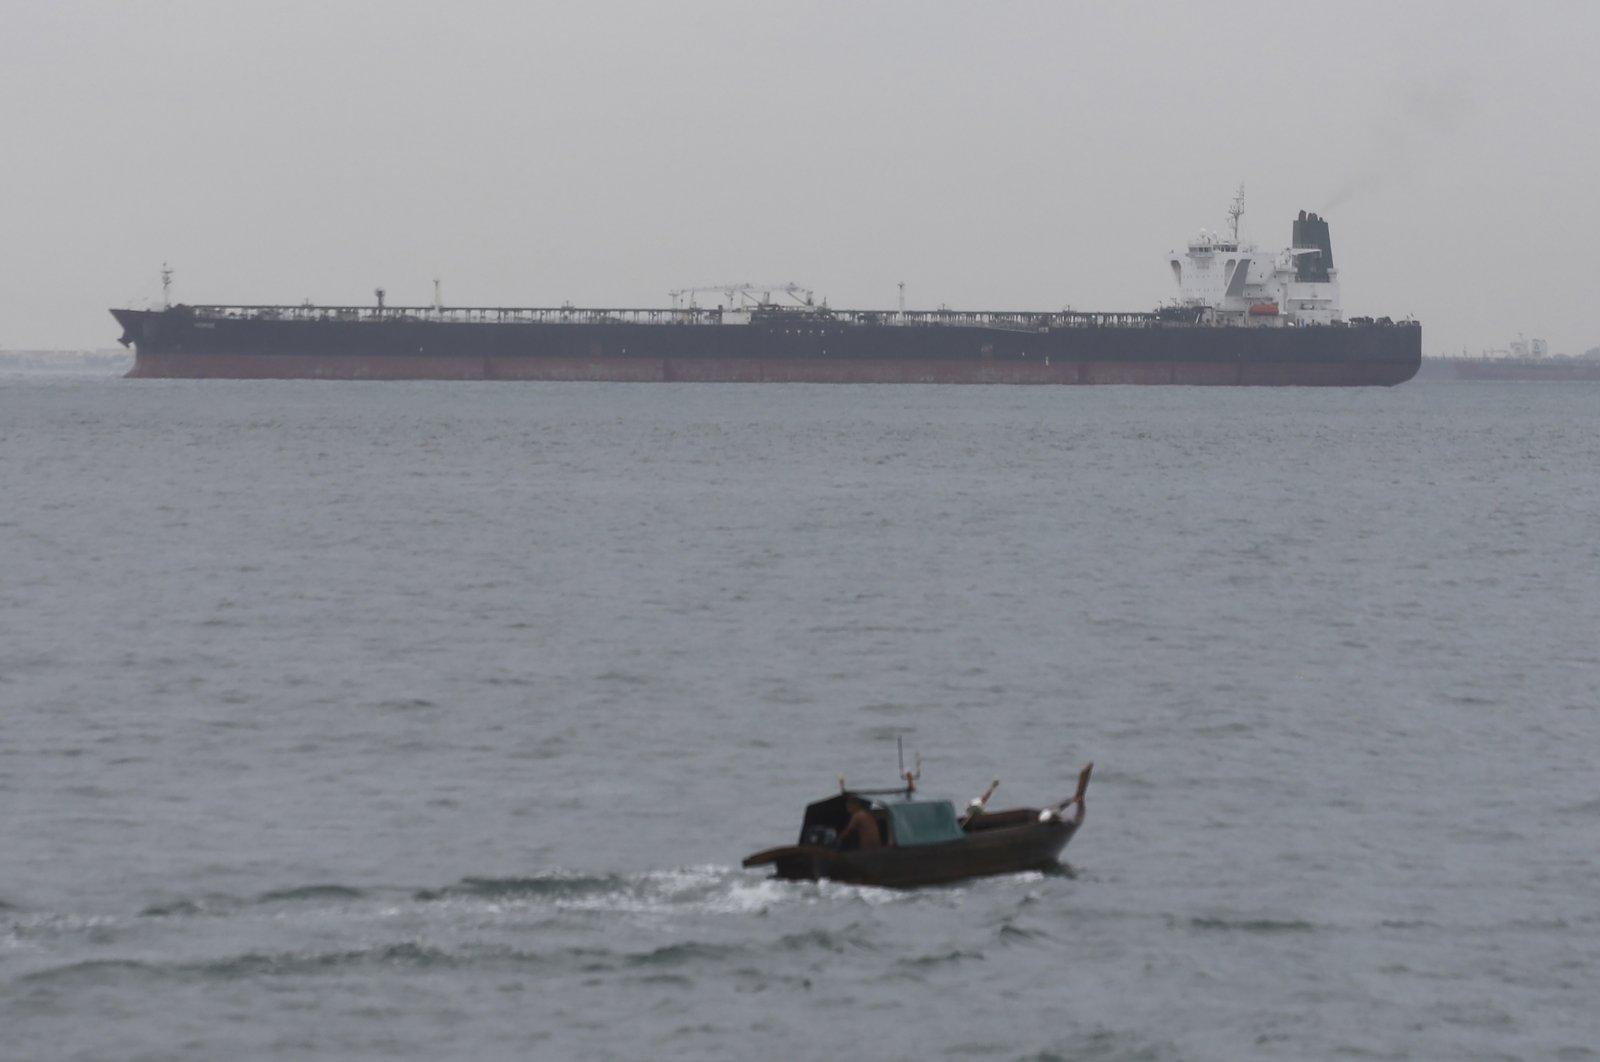 The Iranian-flagged MT Horse tanker sits anchored off Batam Island, Indonesia, Jan. 28, 2021. (AP Photo)